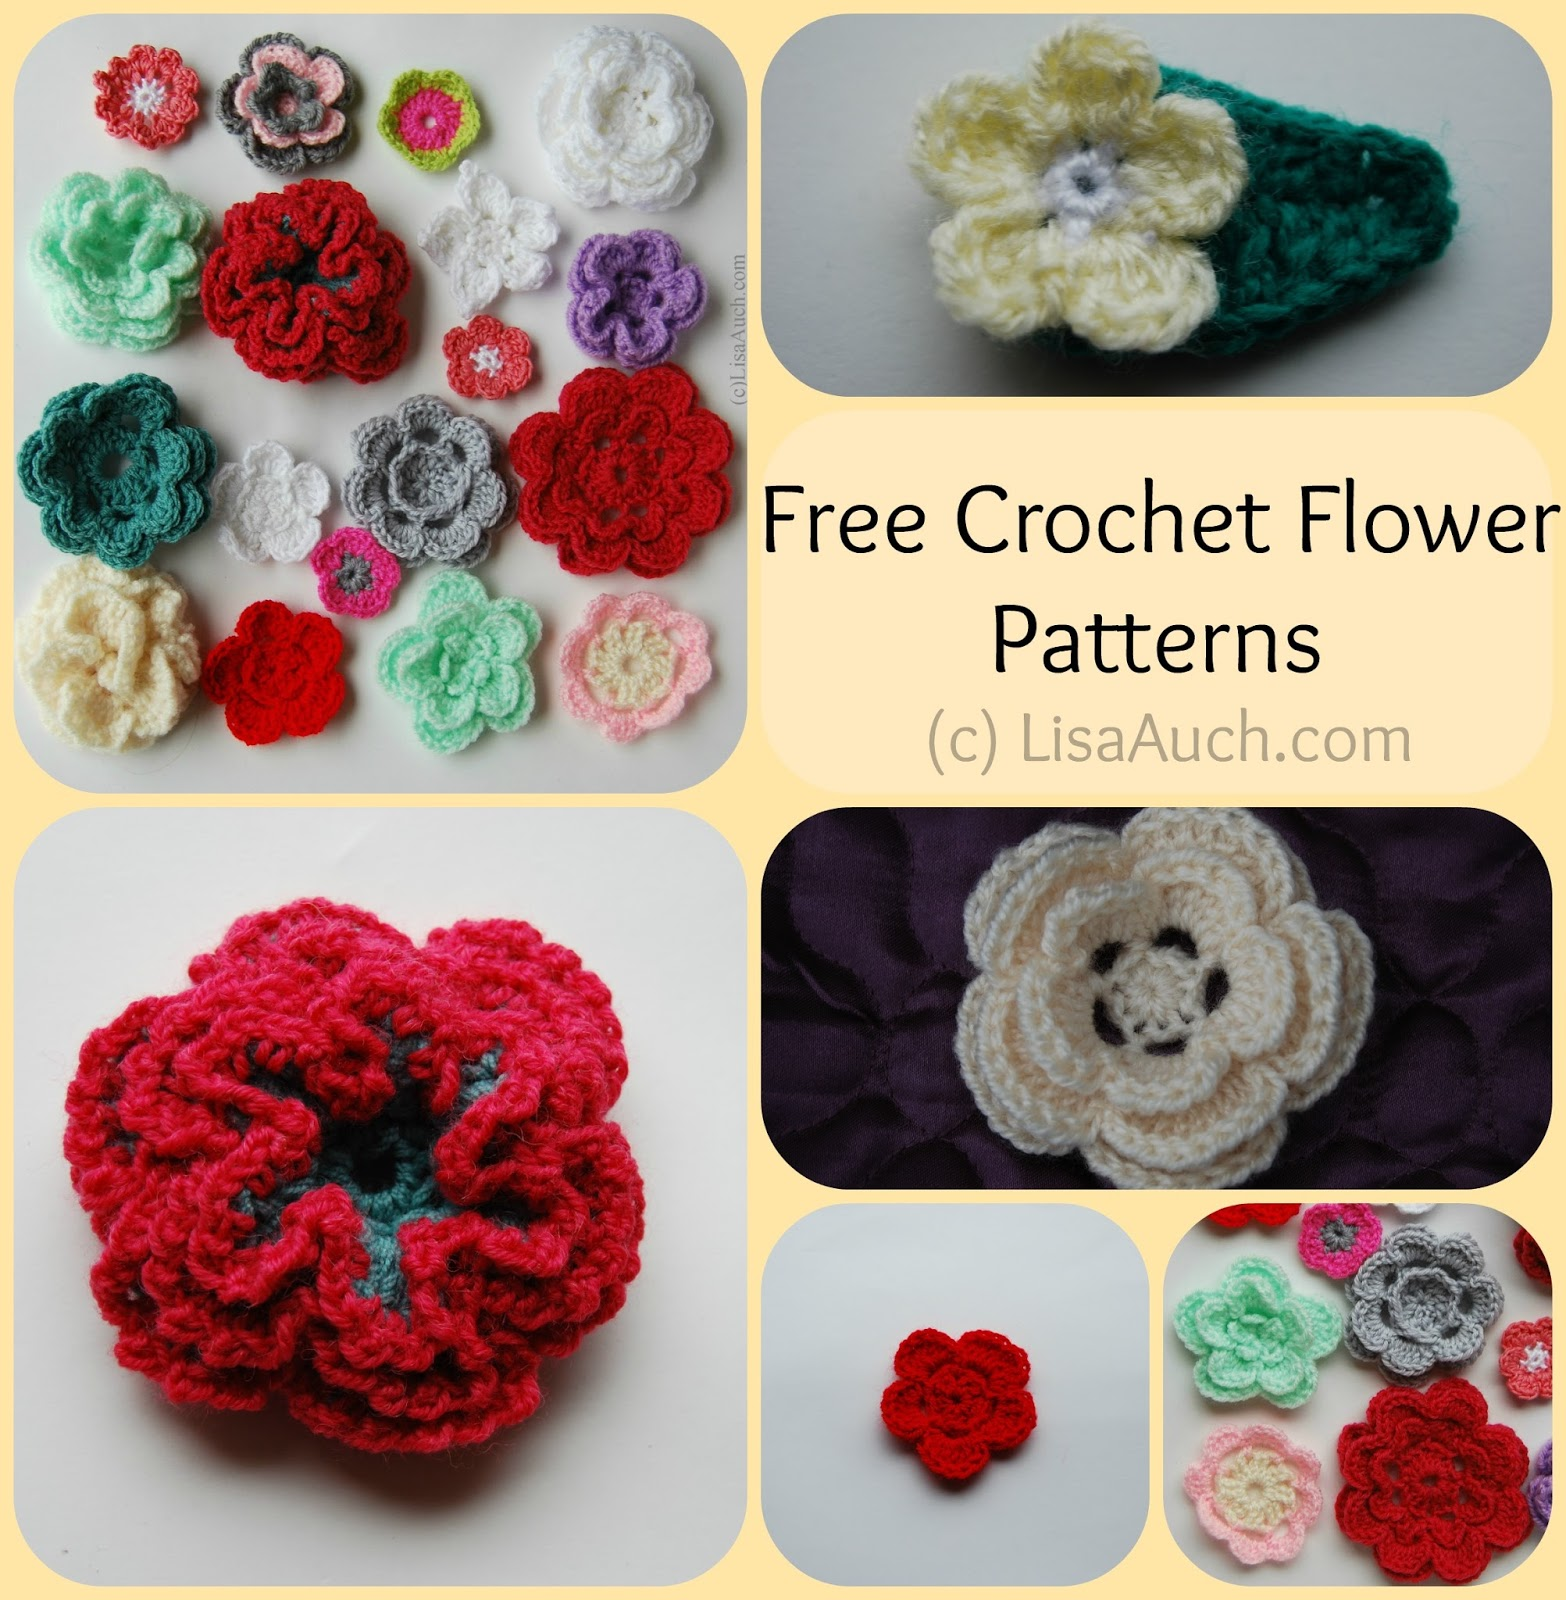 Free Crochet Flower Pattern How to crochet a rose